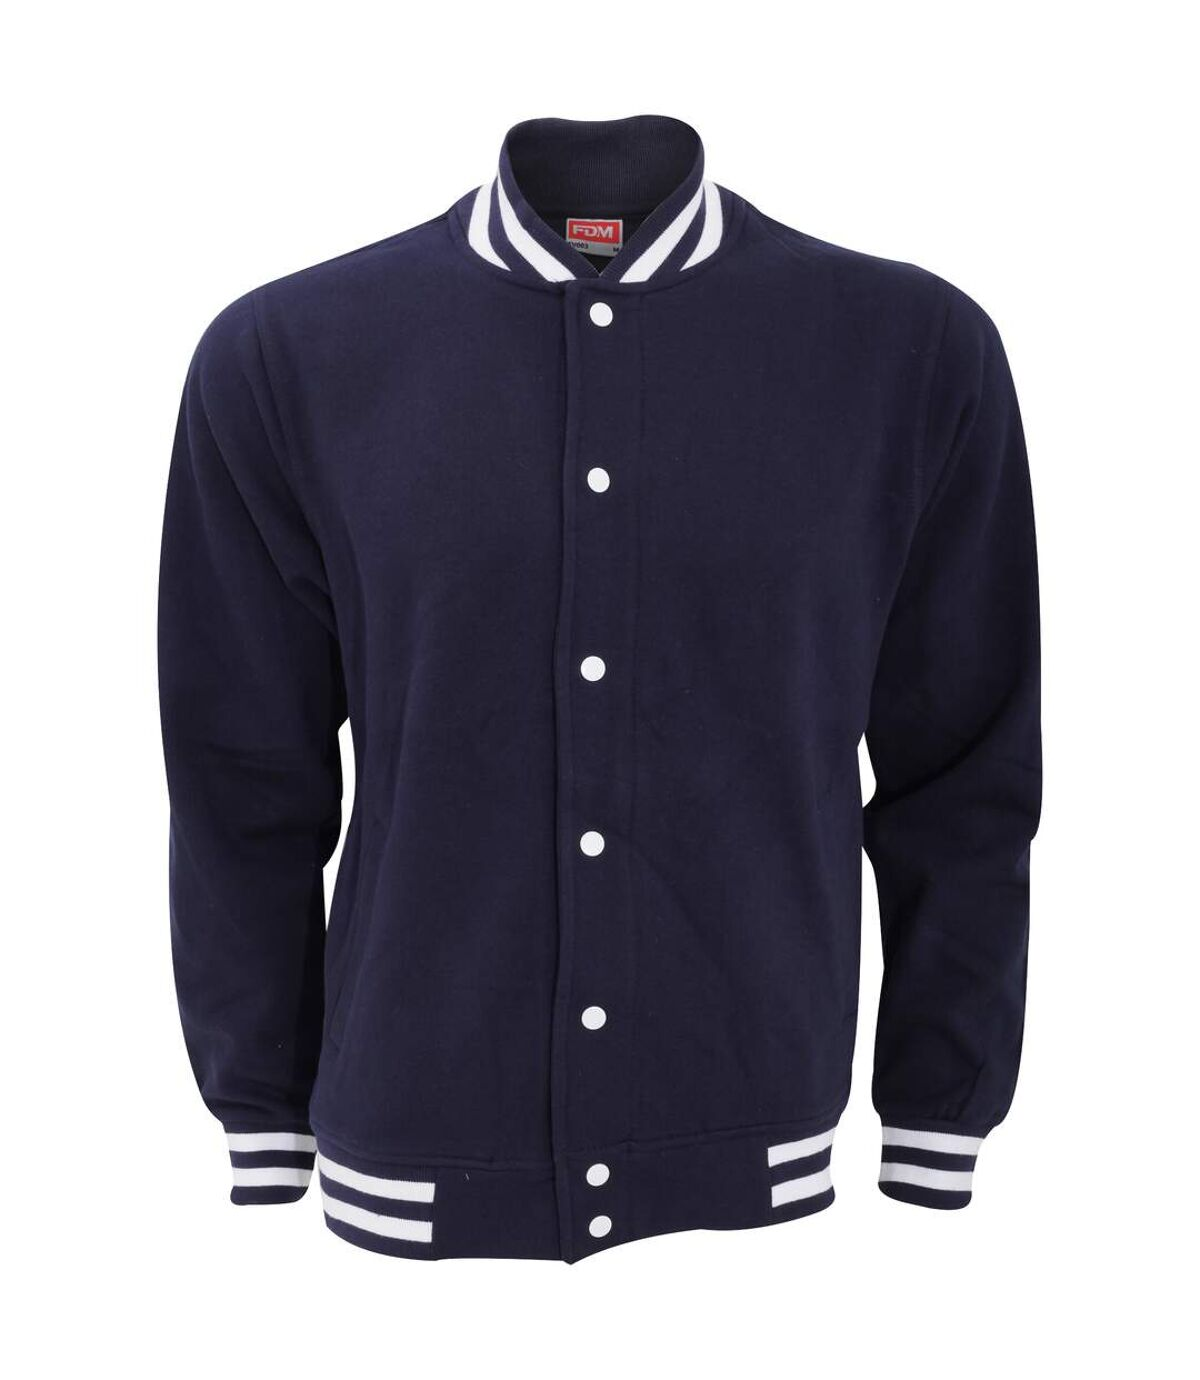 FDM Unisex Campus Varsity Jacket (Navy/White) - UTBC3182